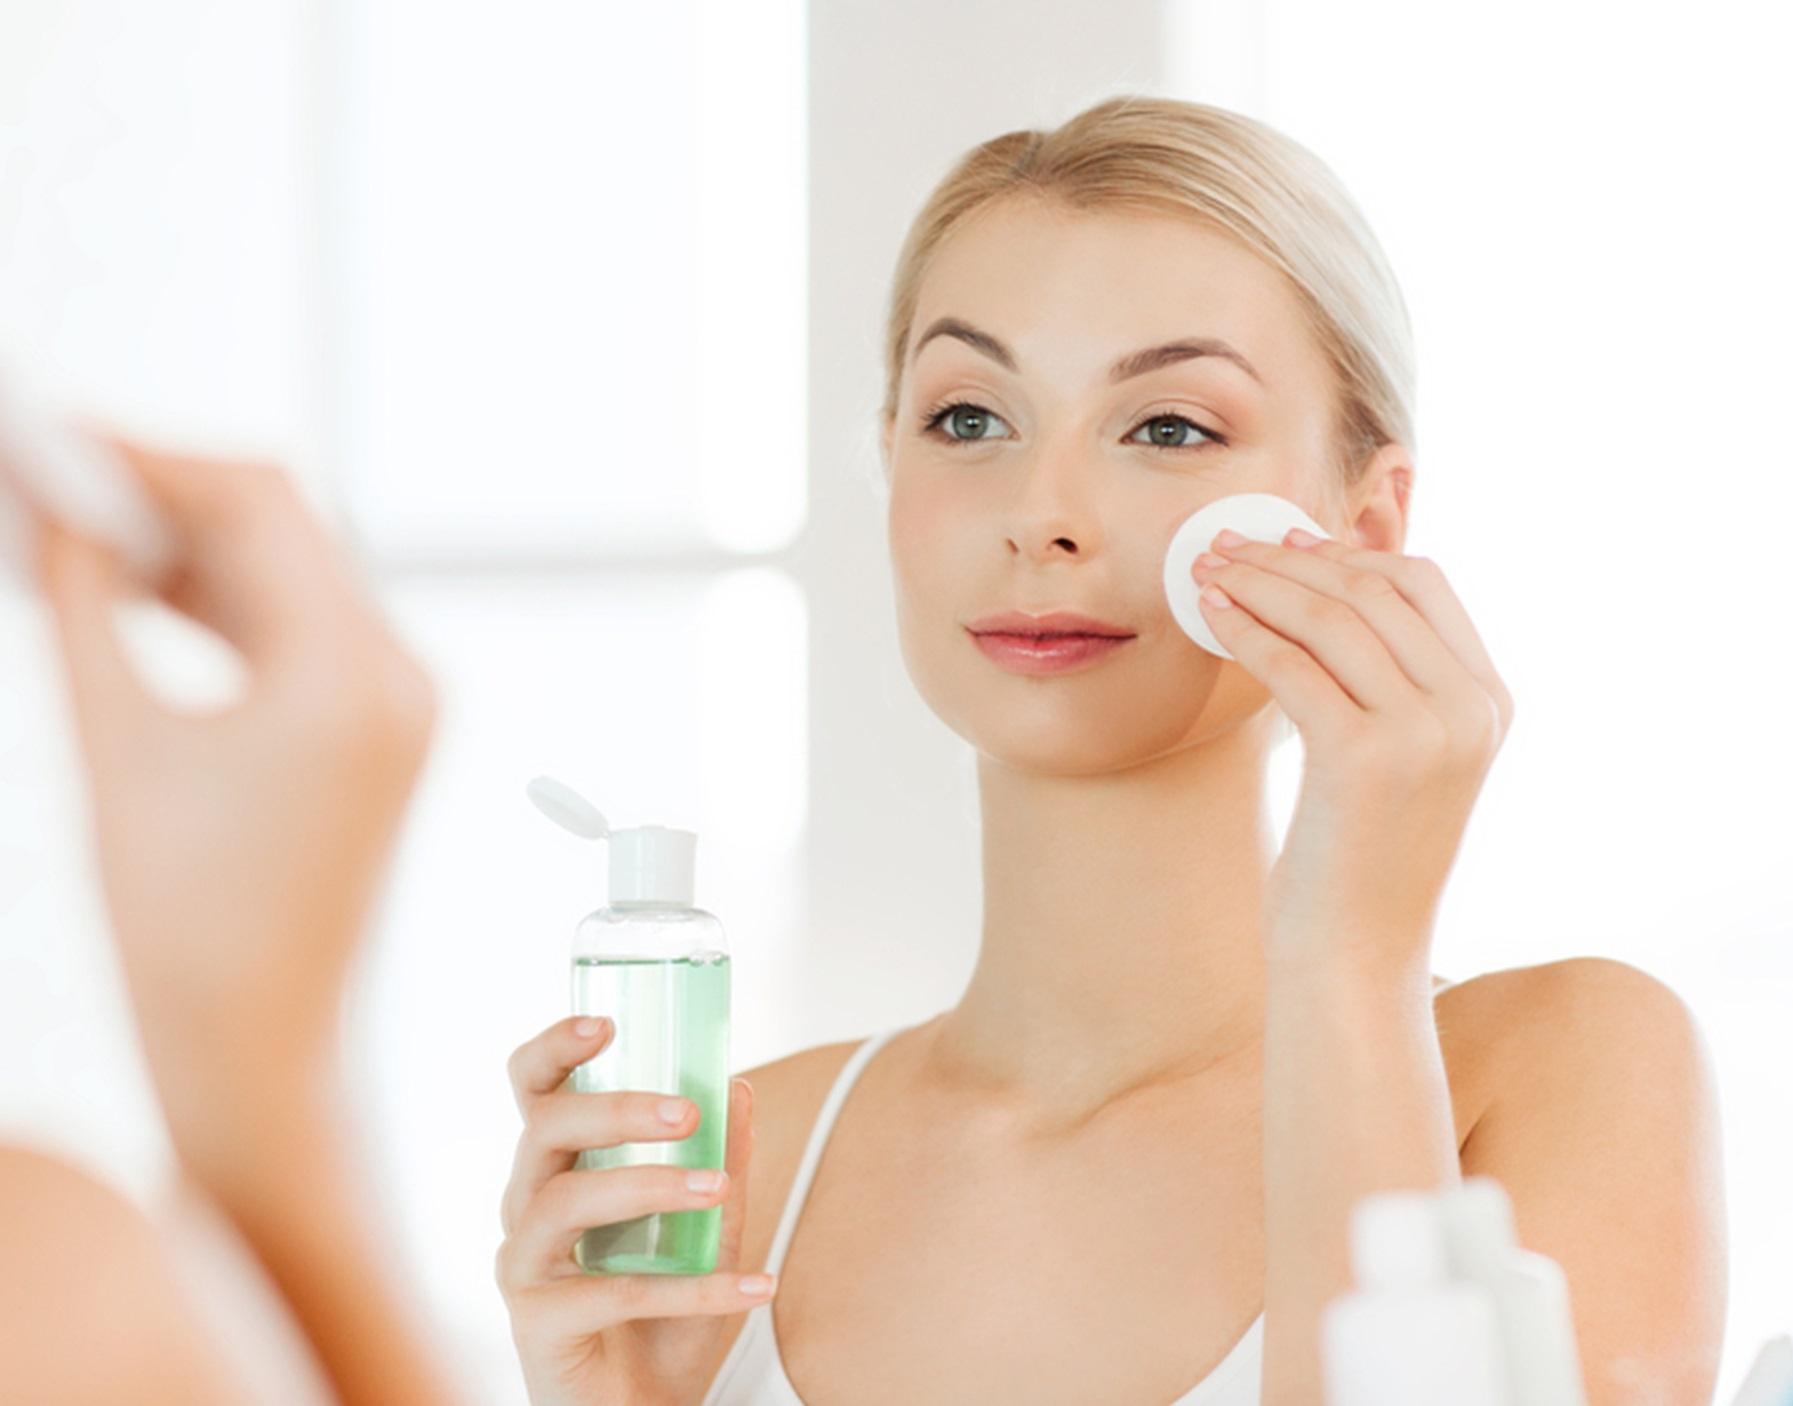 PunjabKesari, Skin Tightening Image, Beauty Secrets Image, जवां दिखने के लिए टिप्स इमेज, एस्ट्रिजेंट इमेज